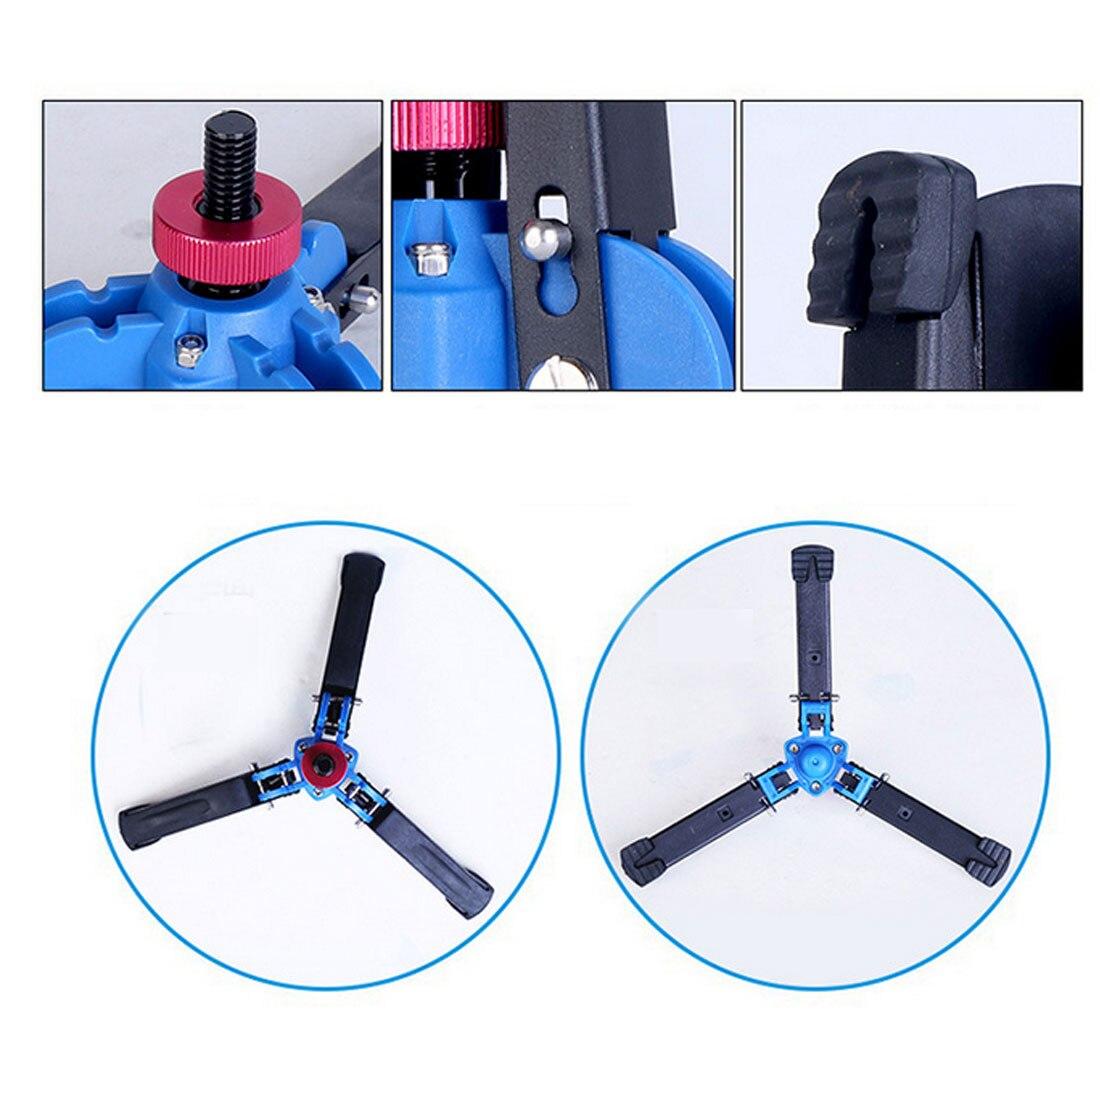 1pcs High Quality M-1 Hydraulic Universal Three Feet Support Stand Base for Monopod with 3/8 screw high quality hydraulic valve dg4v 3 3c m u h7 60